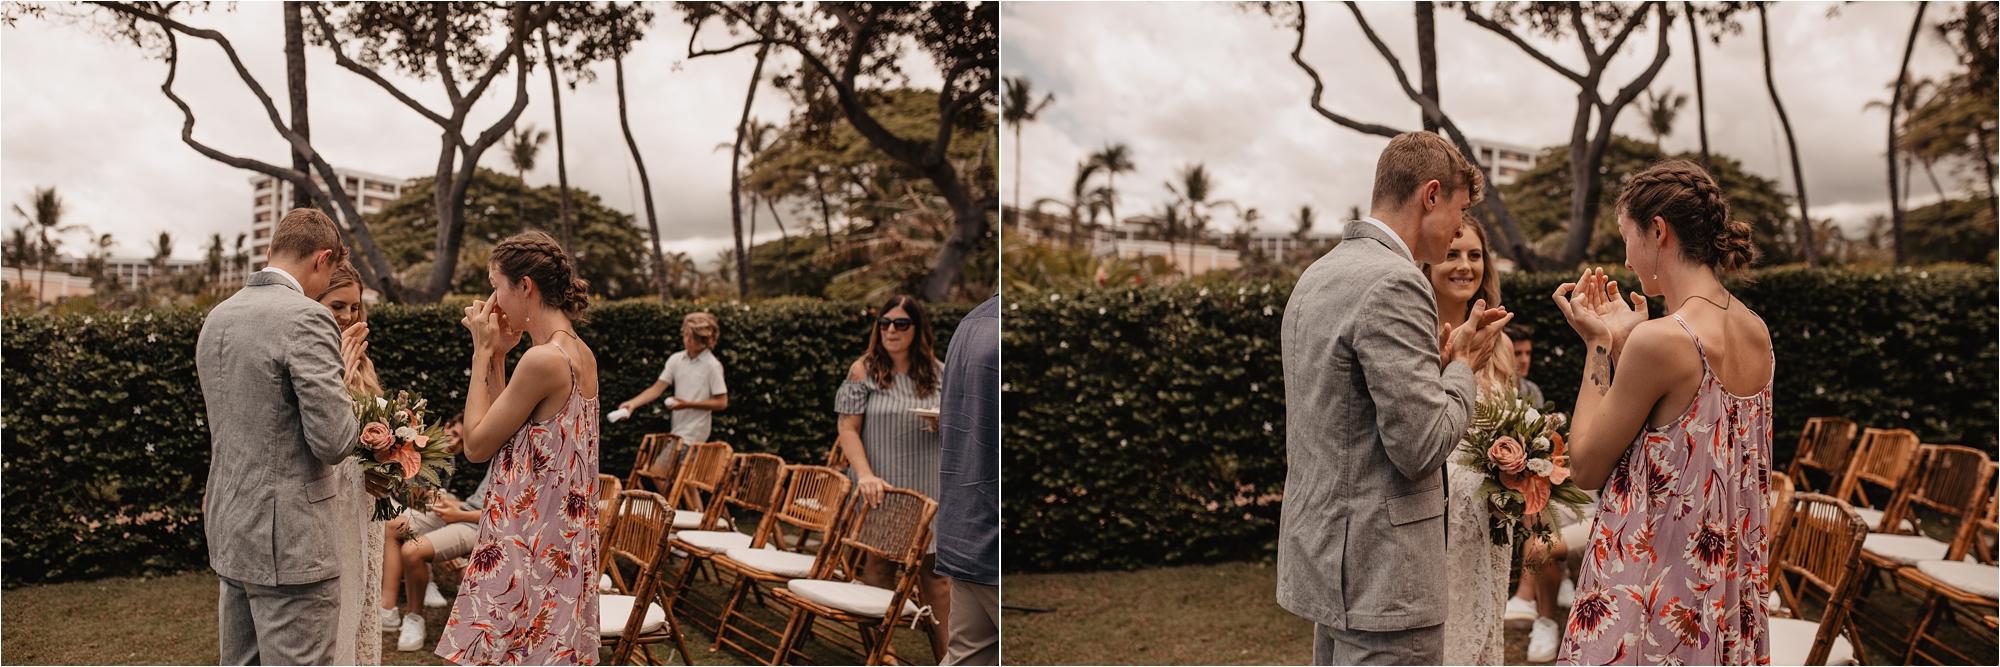 maui-hawaii-intimate-tropical-wedding_0048.jpg